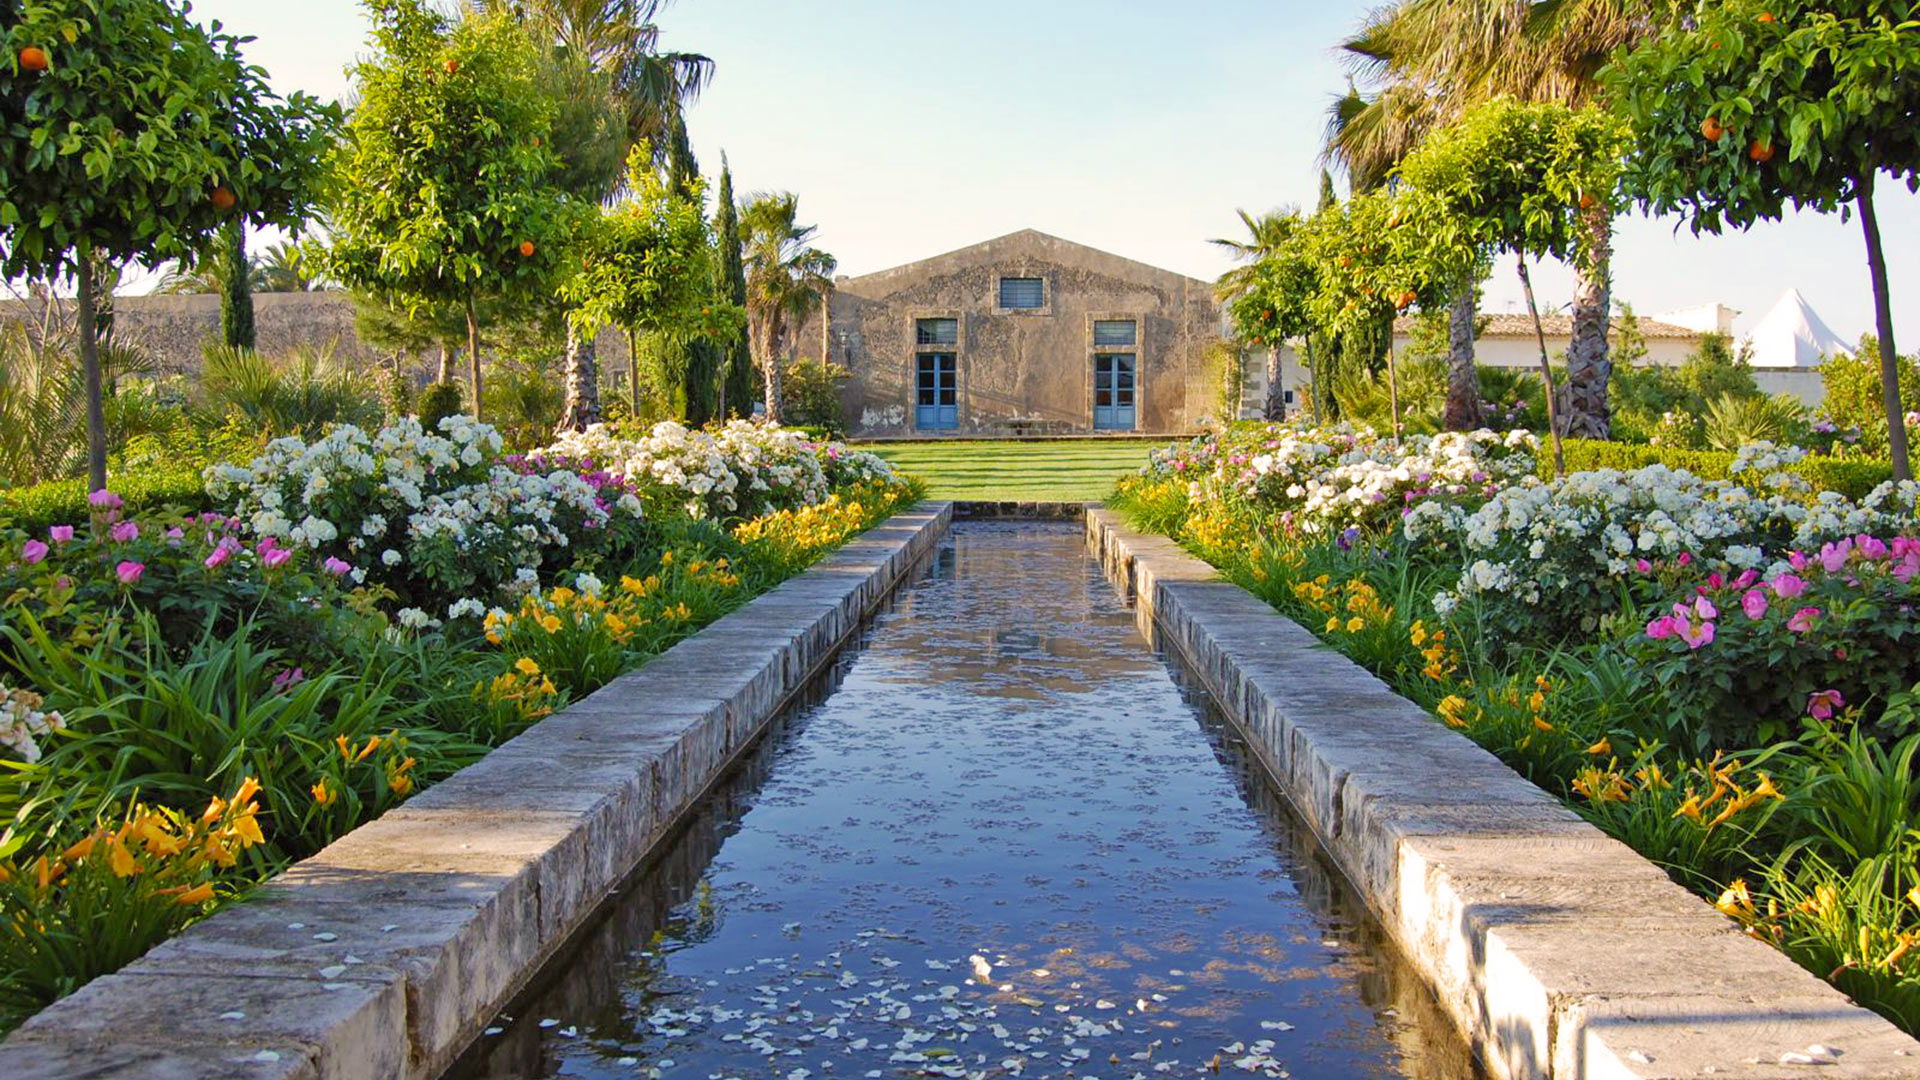 Villa Pietra Bianca - Villa rental in Sicily, Sicily South ...